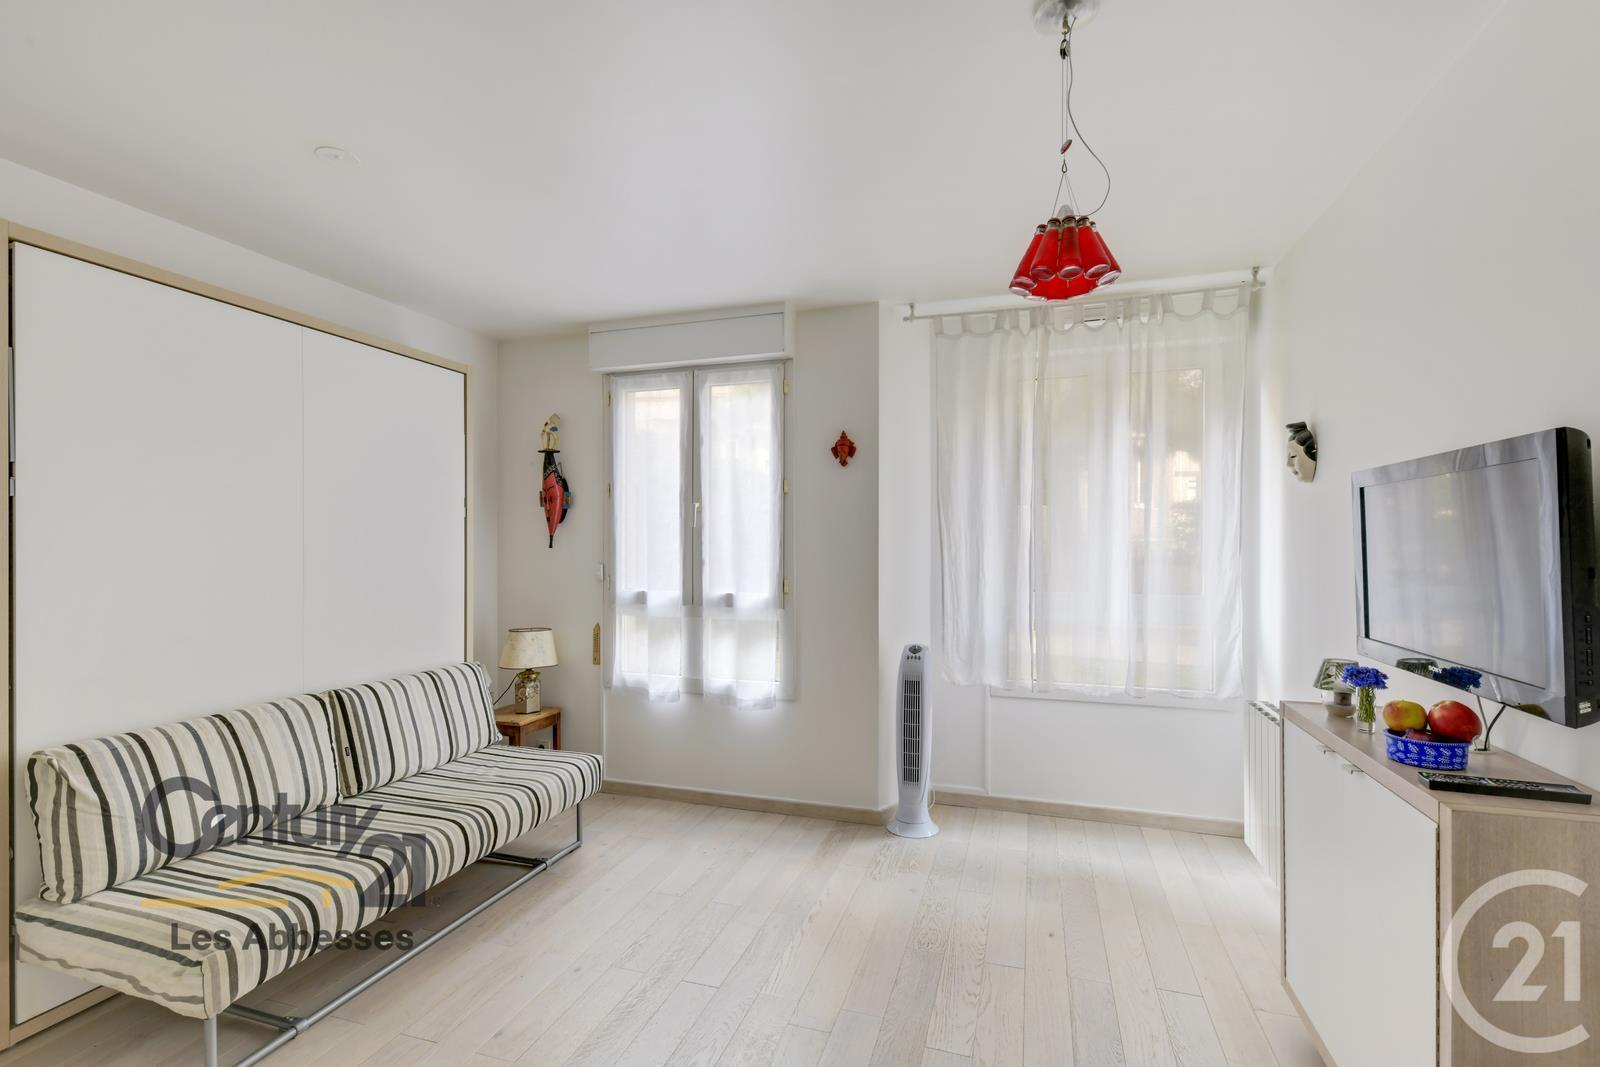 appartement f1 vendre 1 pi ce 24 m2 paris 75018. Black Bedroom Furniture Sets. Home Design Ideas